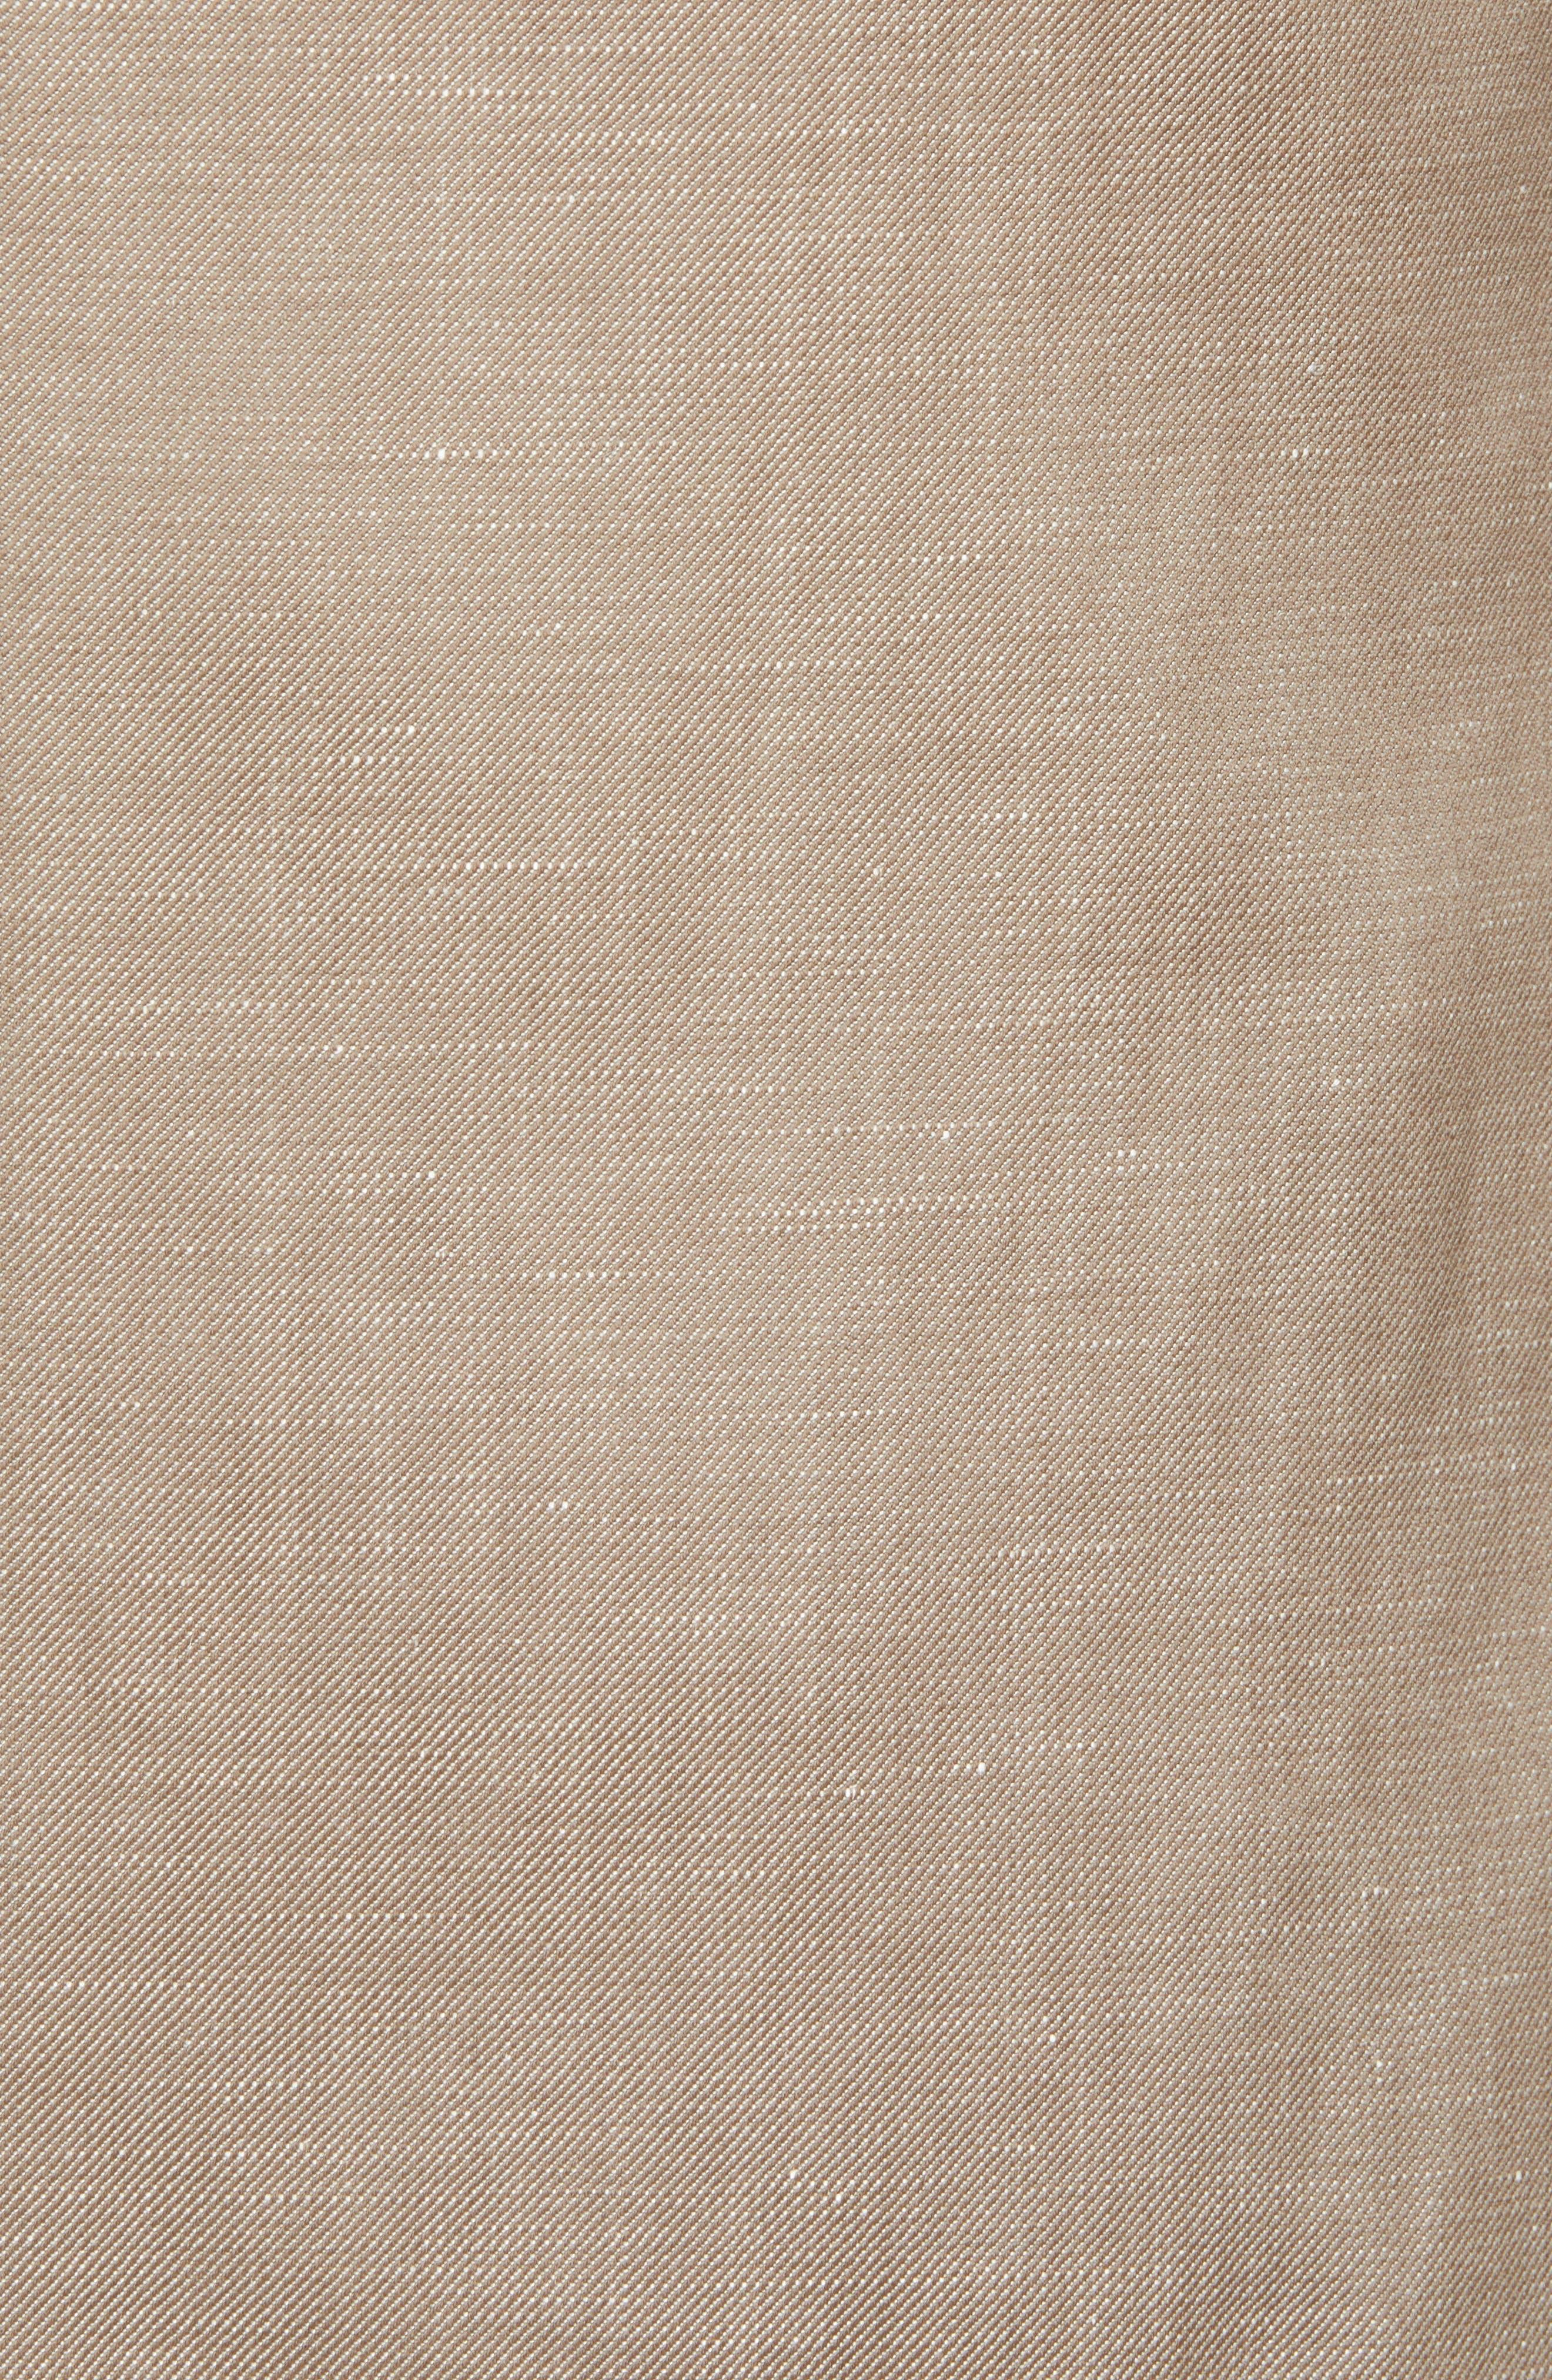 Traditional Fit Wool & Linen Blazer,                             Alternate thumbnail 3, color,                             Tan